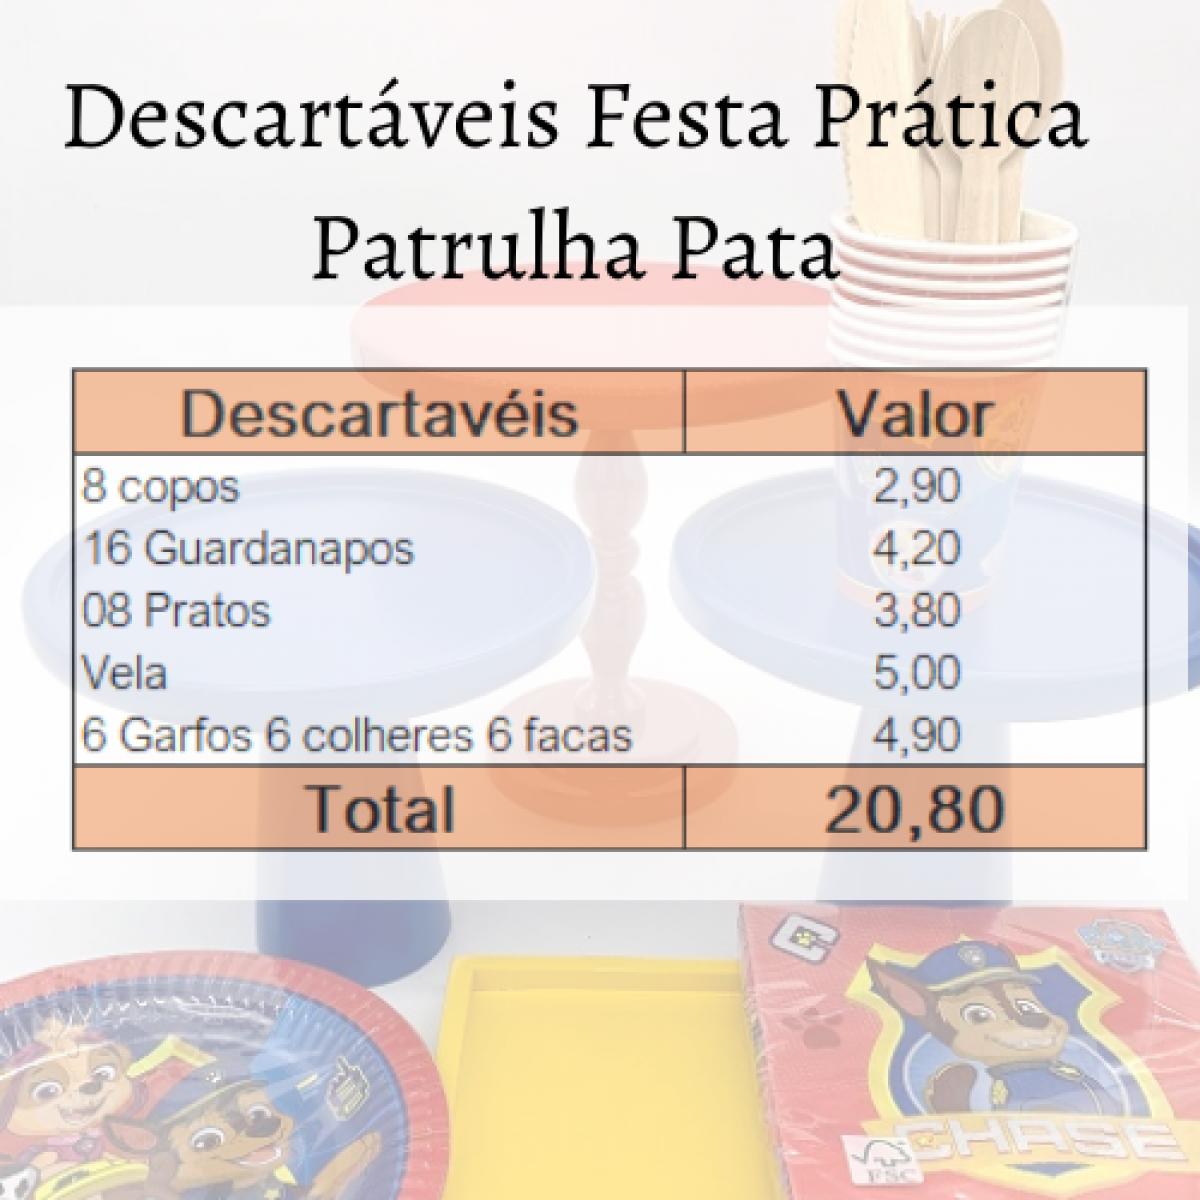 Descartáveis Festa Prática Patrulha Pata